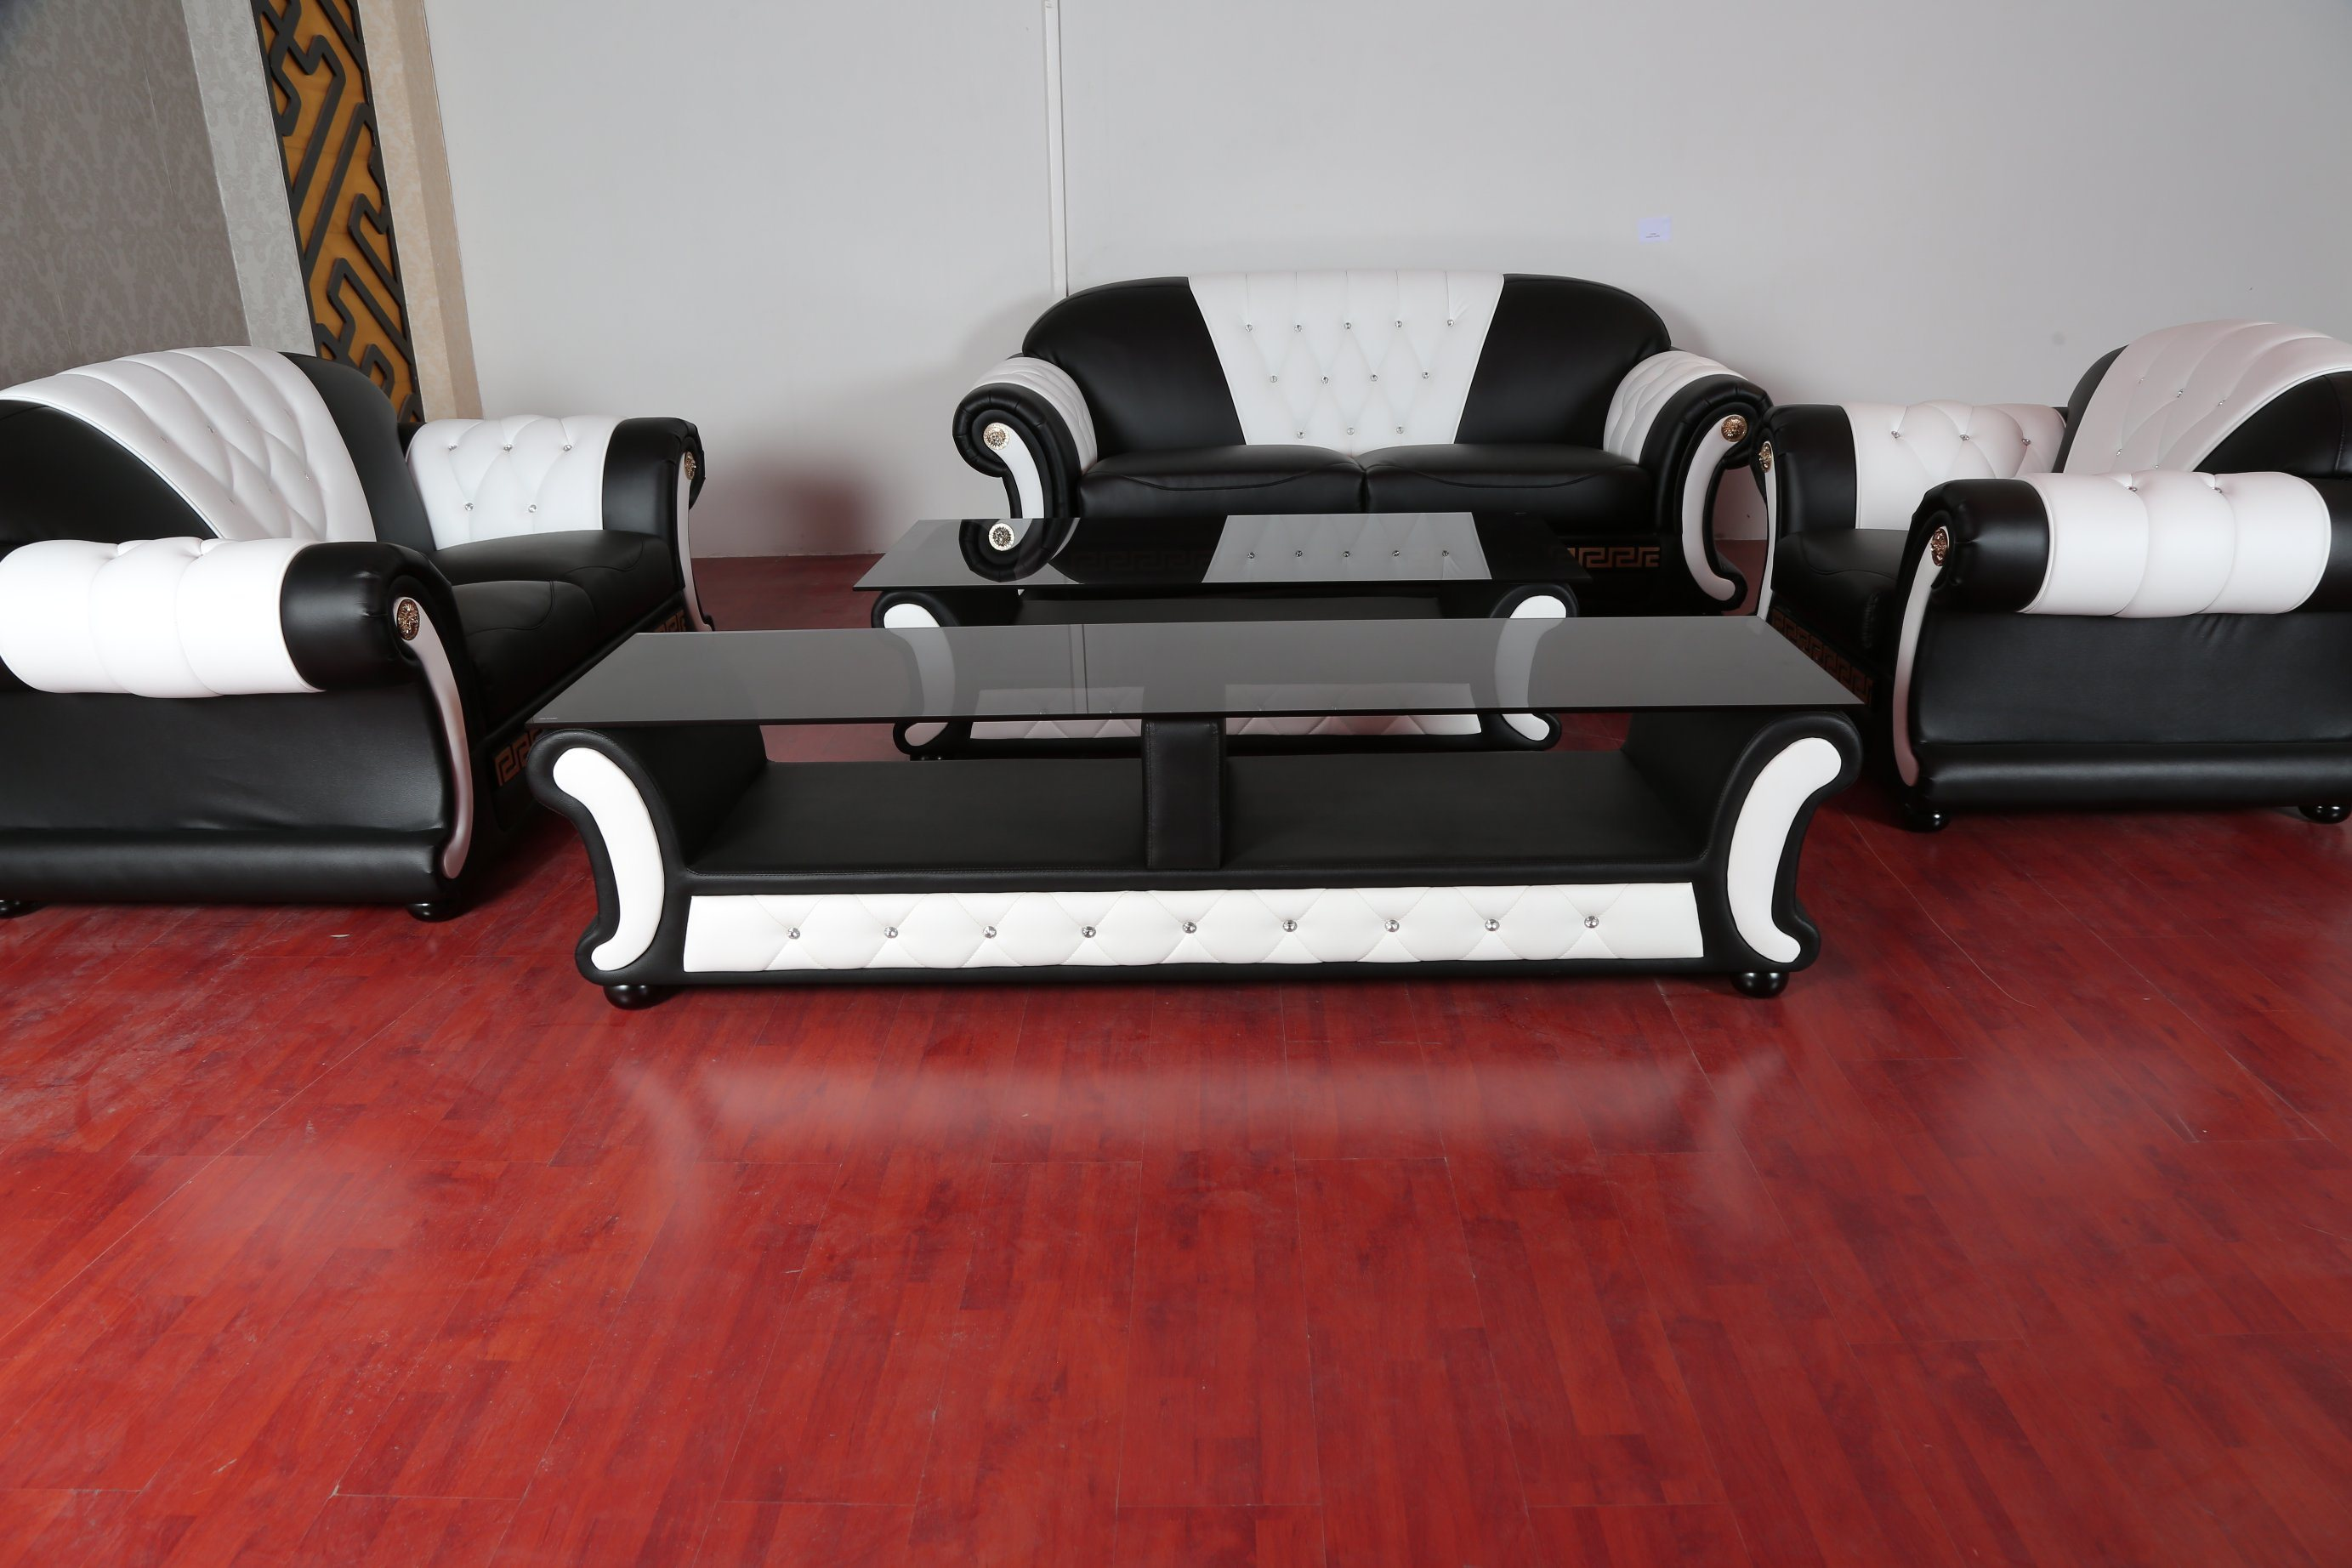 China Recliner Sofa Sets, Recliner Sofa Sets Manufacturers, Suppliers -